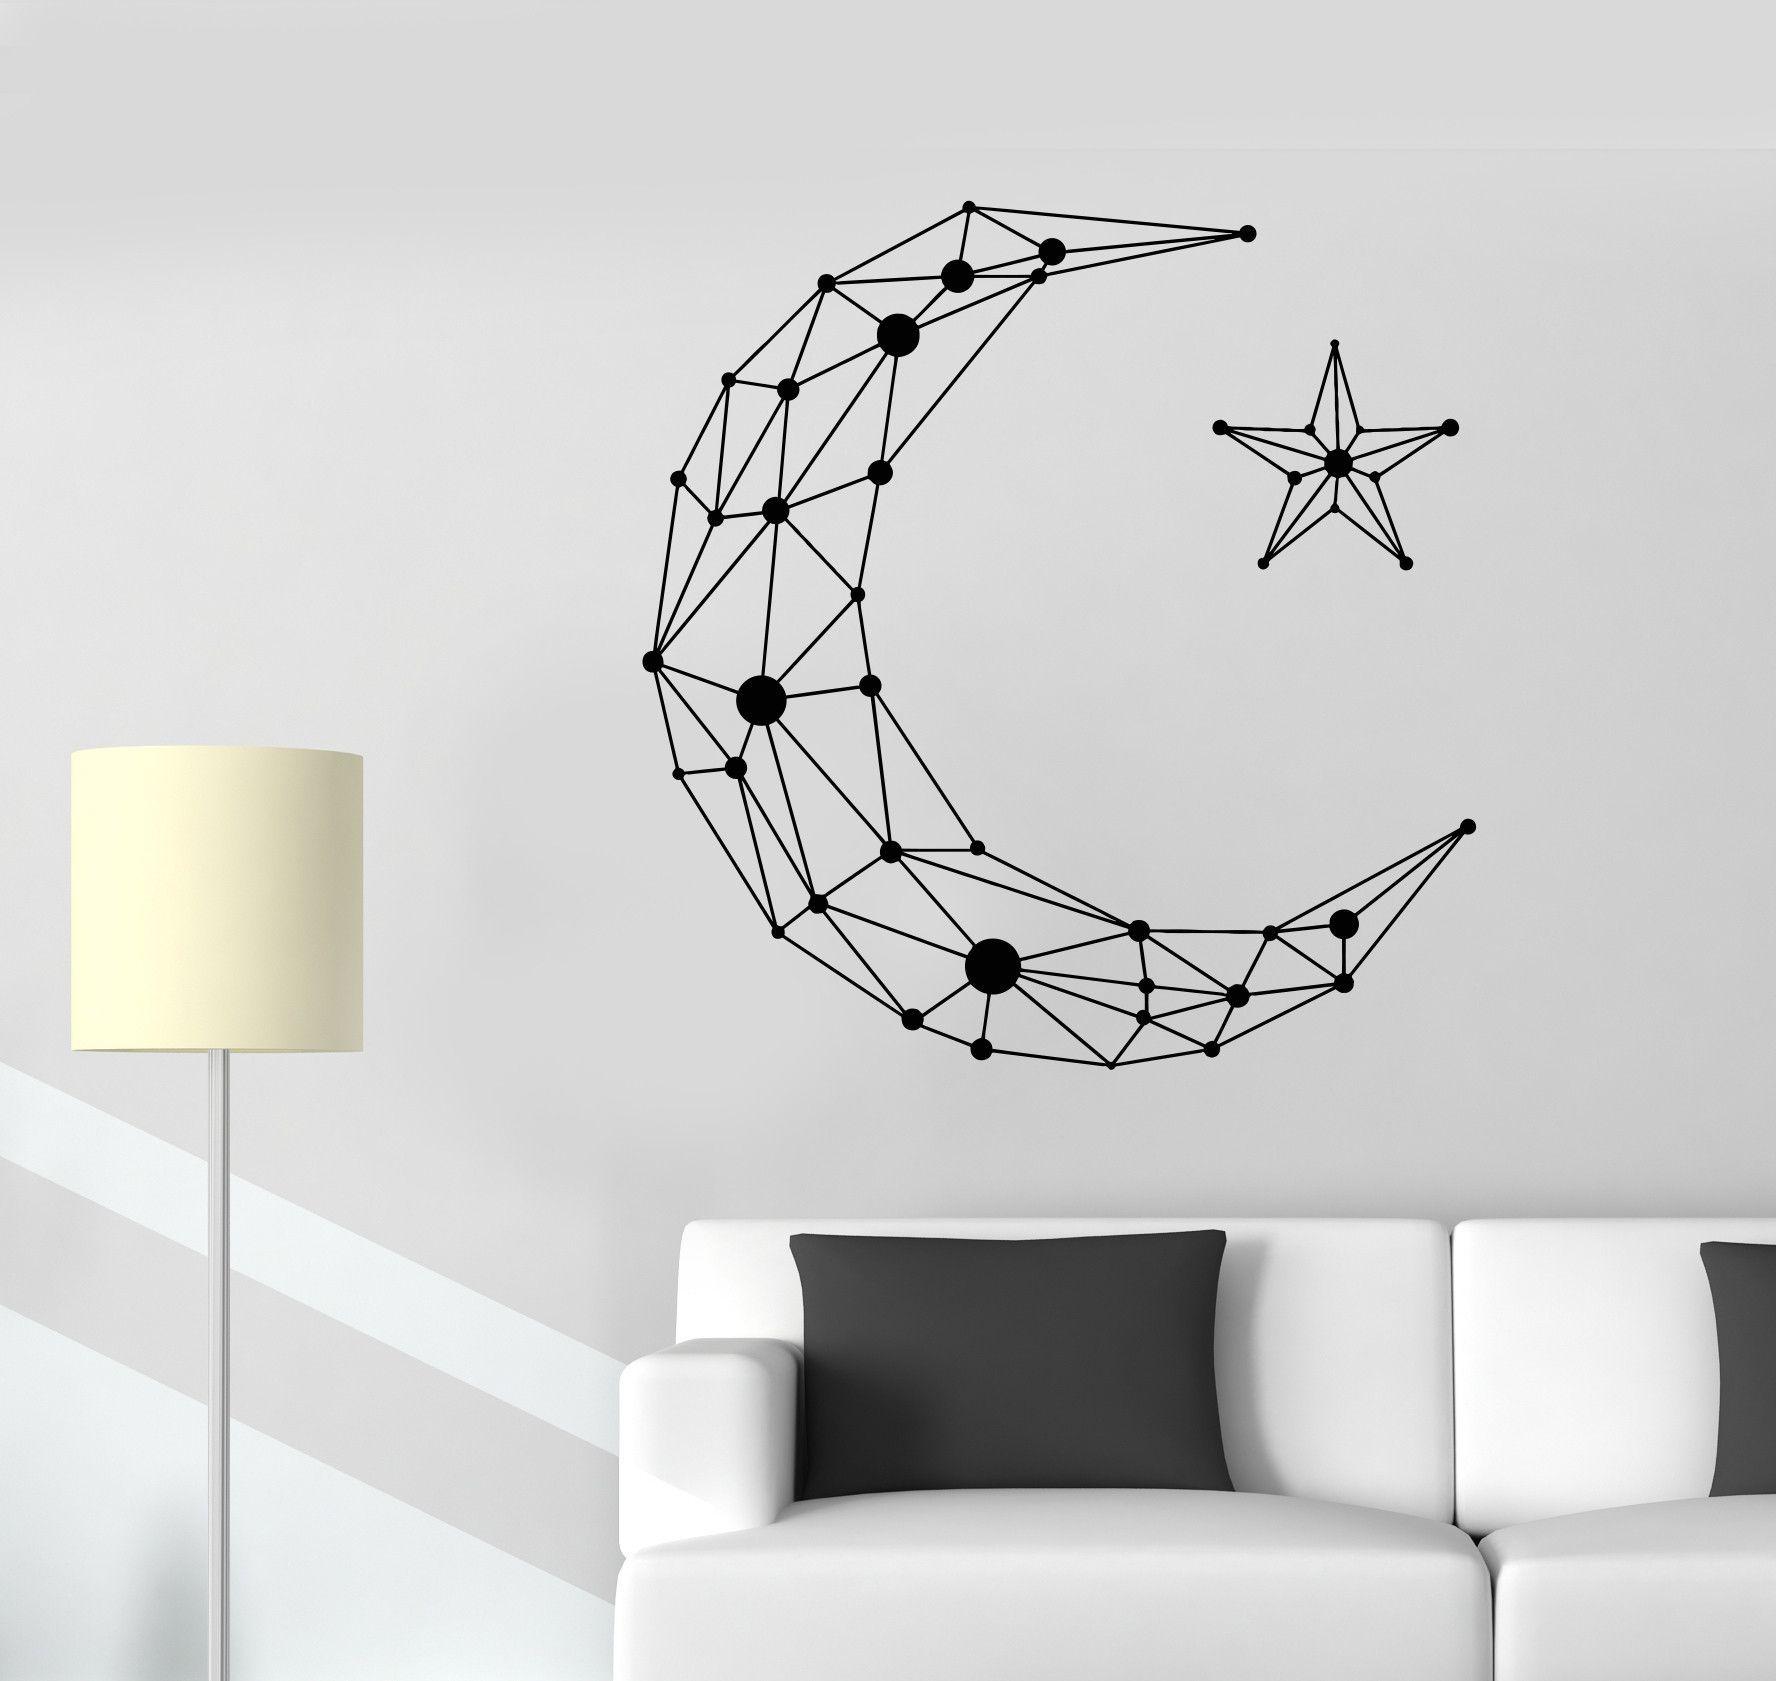 Vinyl Wall Decal Geometric Moon Star Art Decor Room Decoration